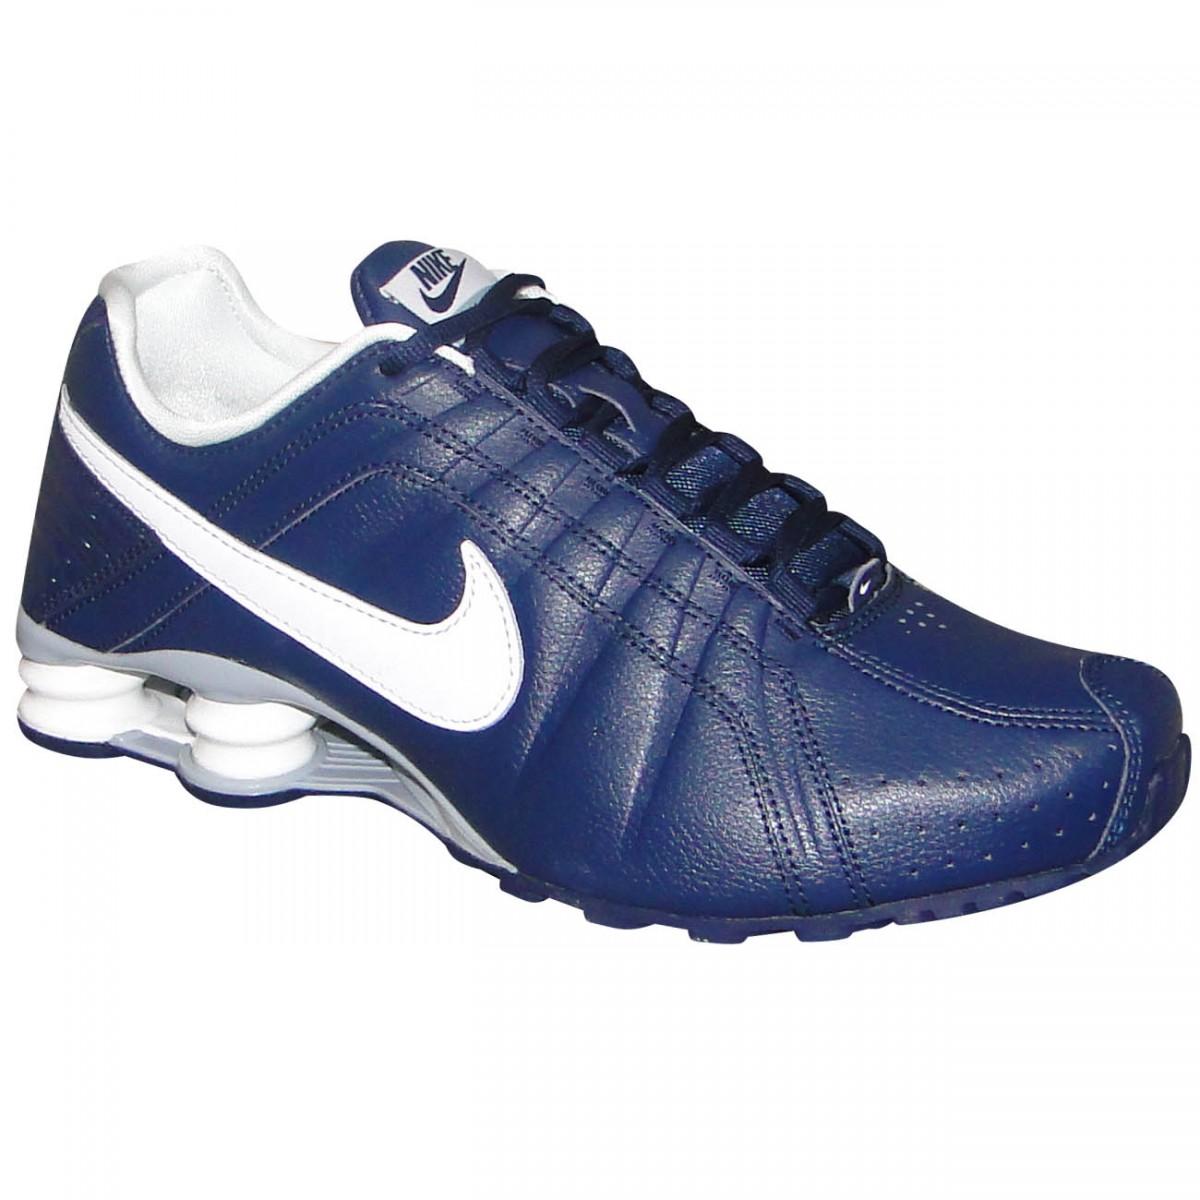 adbf45b7b38 Tenis Nike Shox Junior 454340 402 - Marinho Branco - Chuteira Nike ...